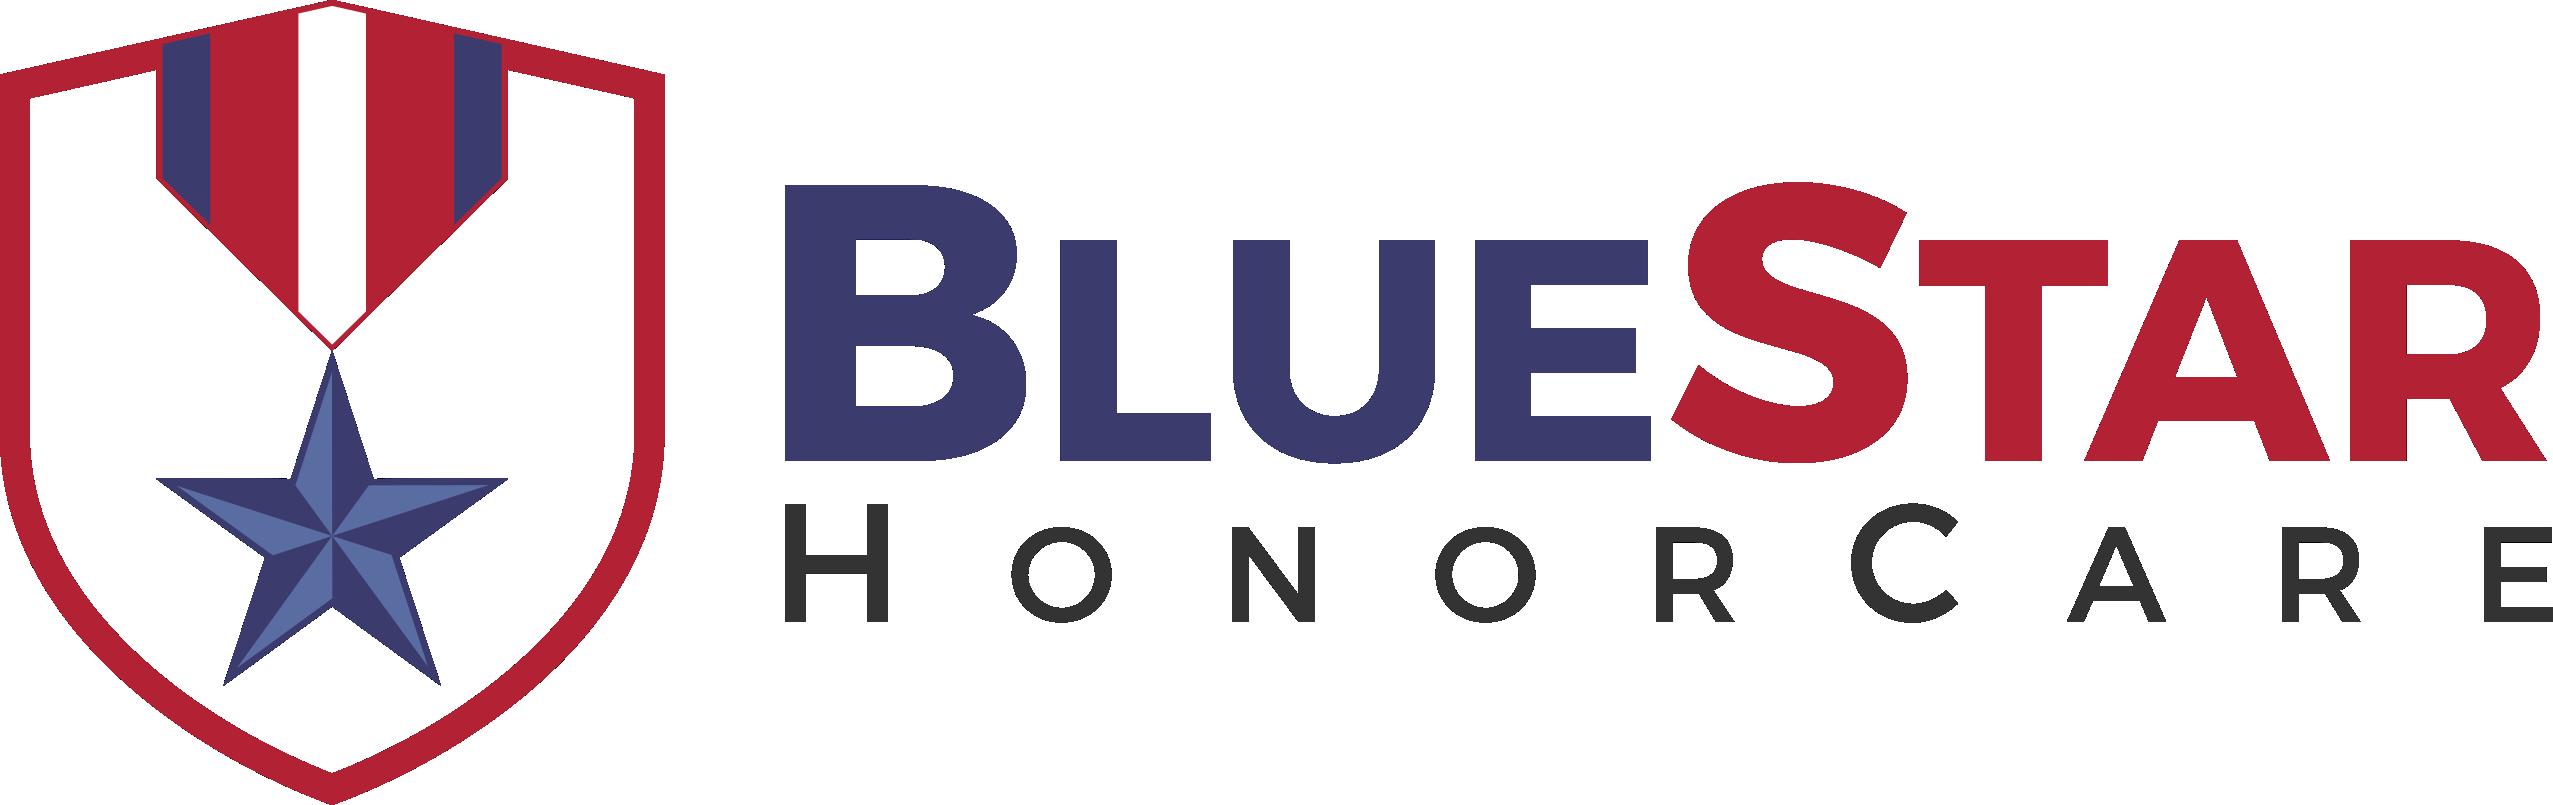 Create a descriptive logo for a company helping elderly military veterans